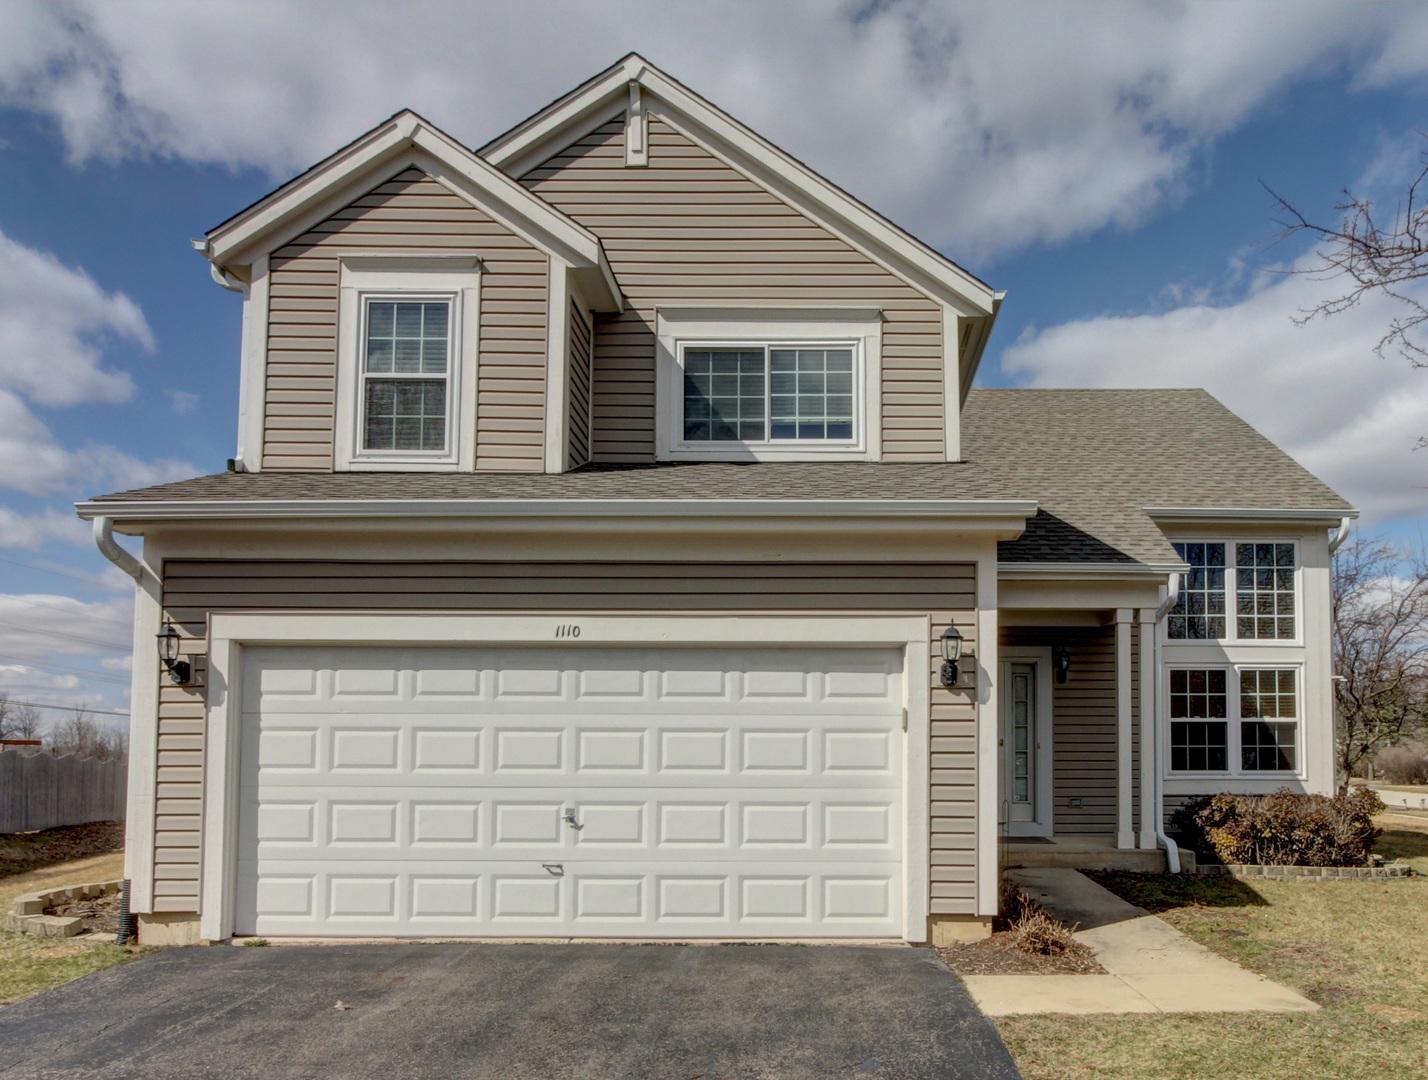 1110 Dorchester, BARTLETT, Illinois, 60103